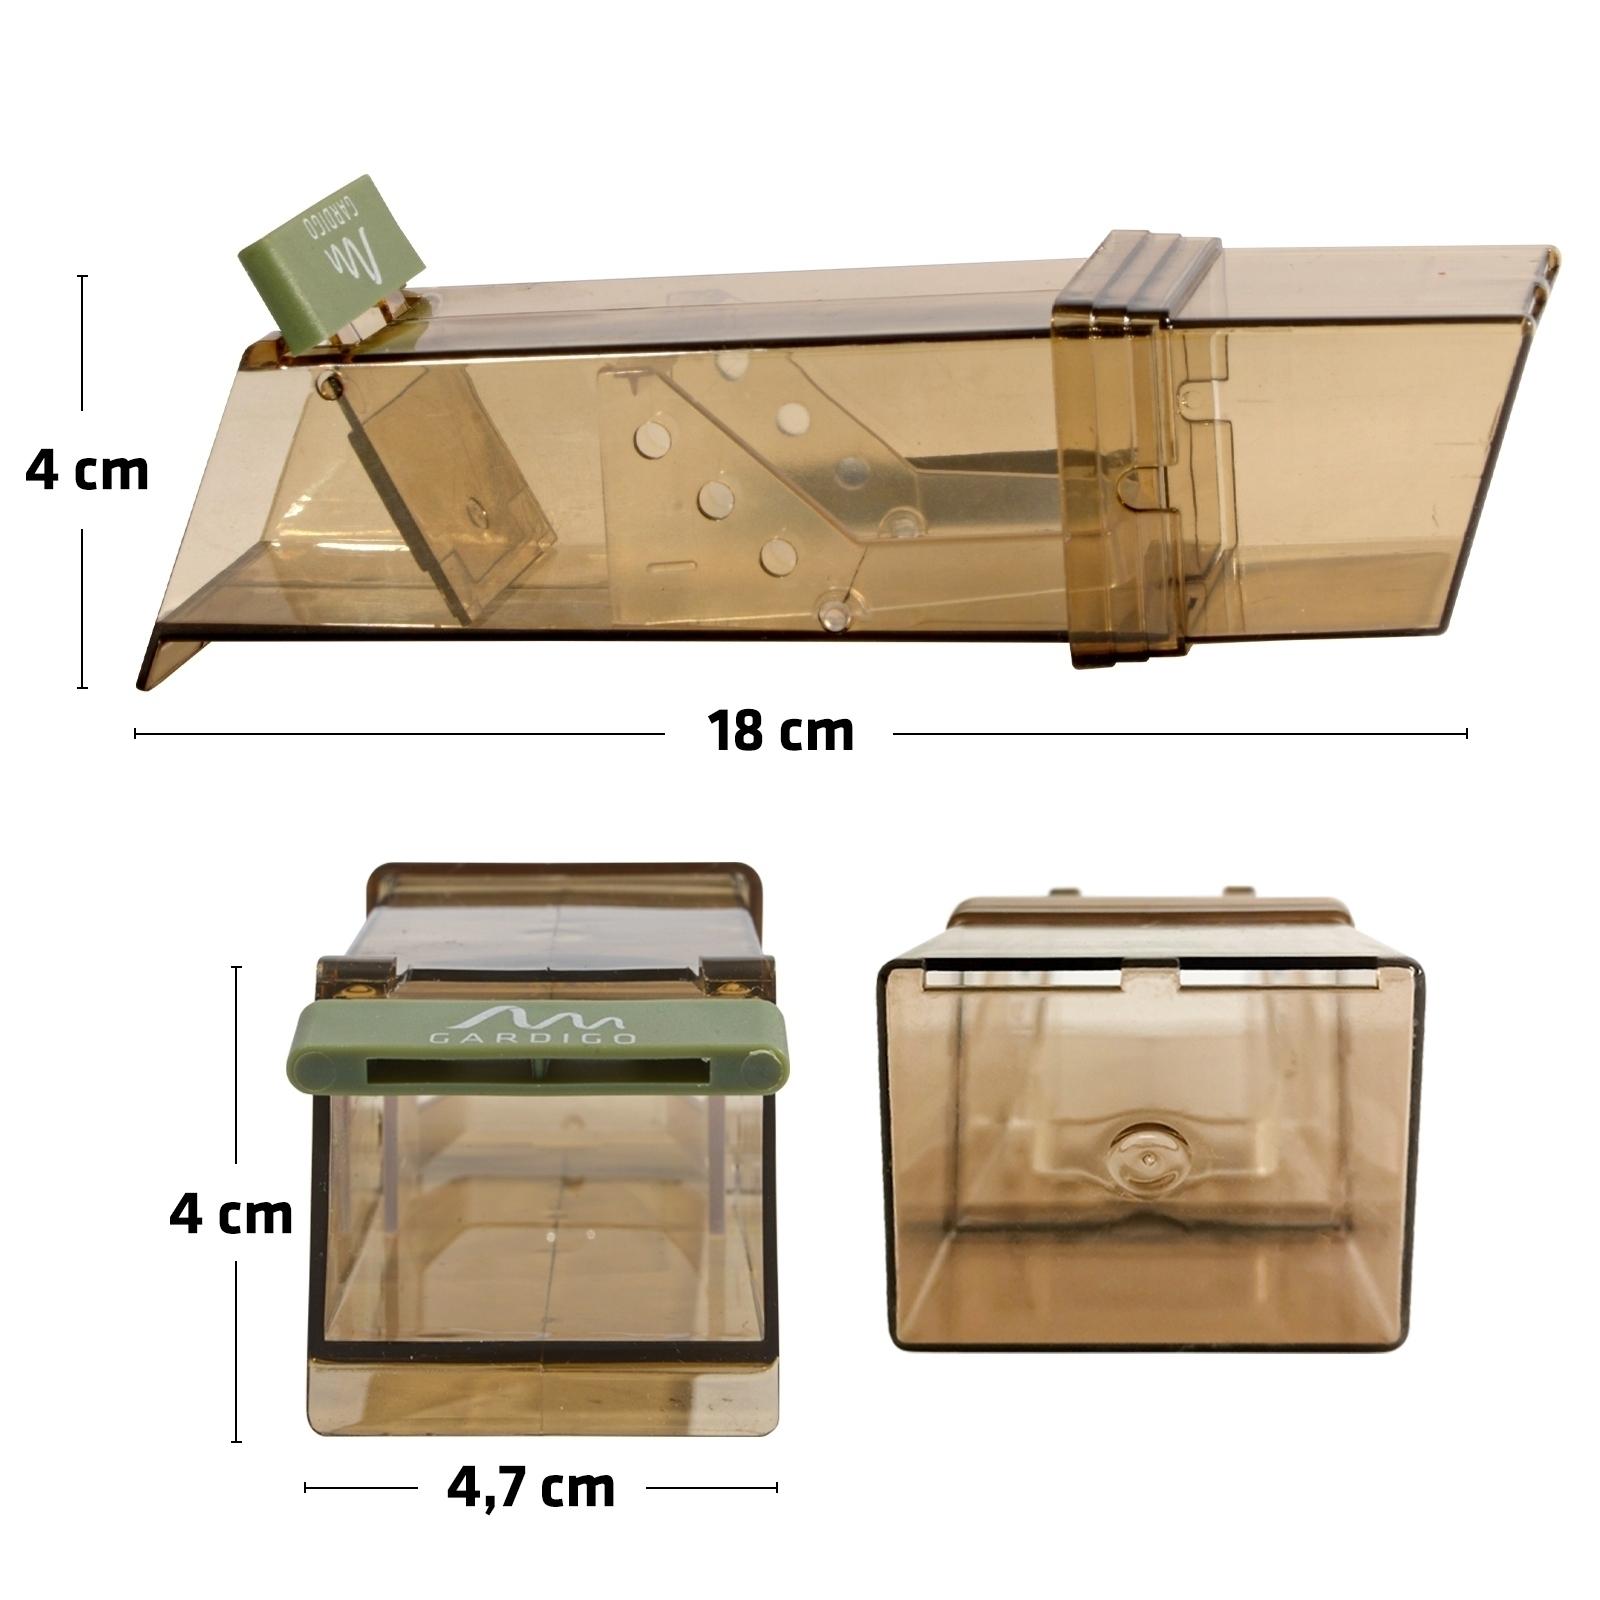 wipp mausefalle 3x lebendfalle m usefalle mausfalle maus falle lebendmausefalle ebay. Black Bedroom Furniture Sets. Home Design Ideas